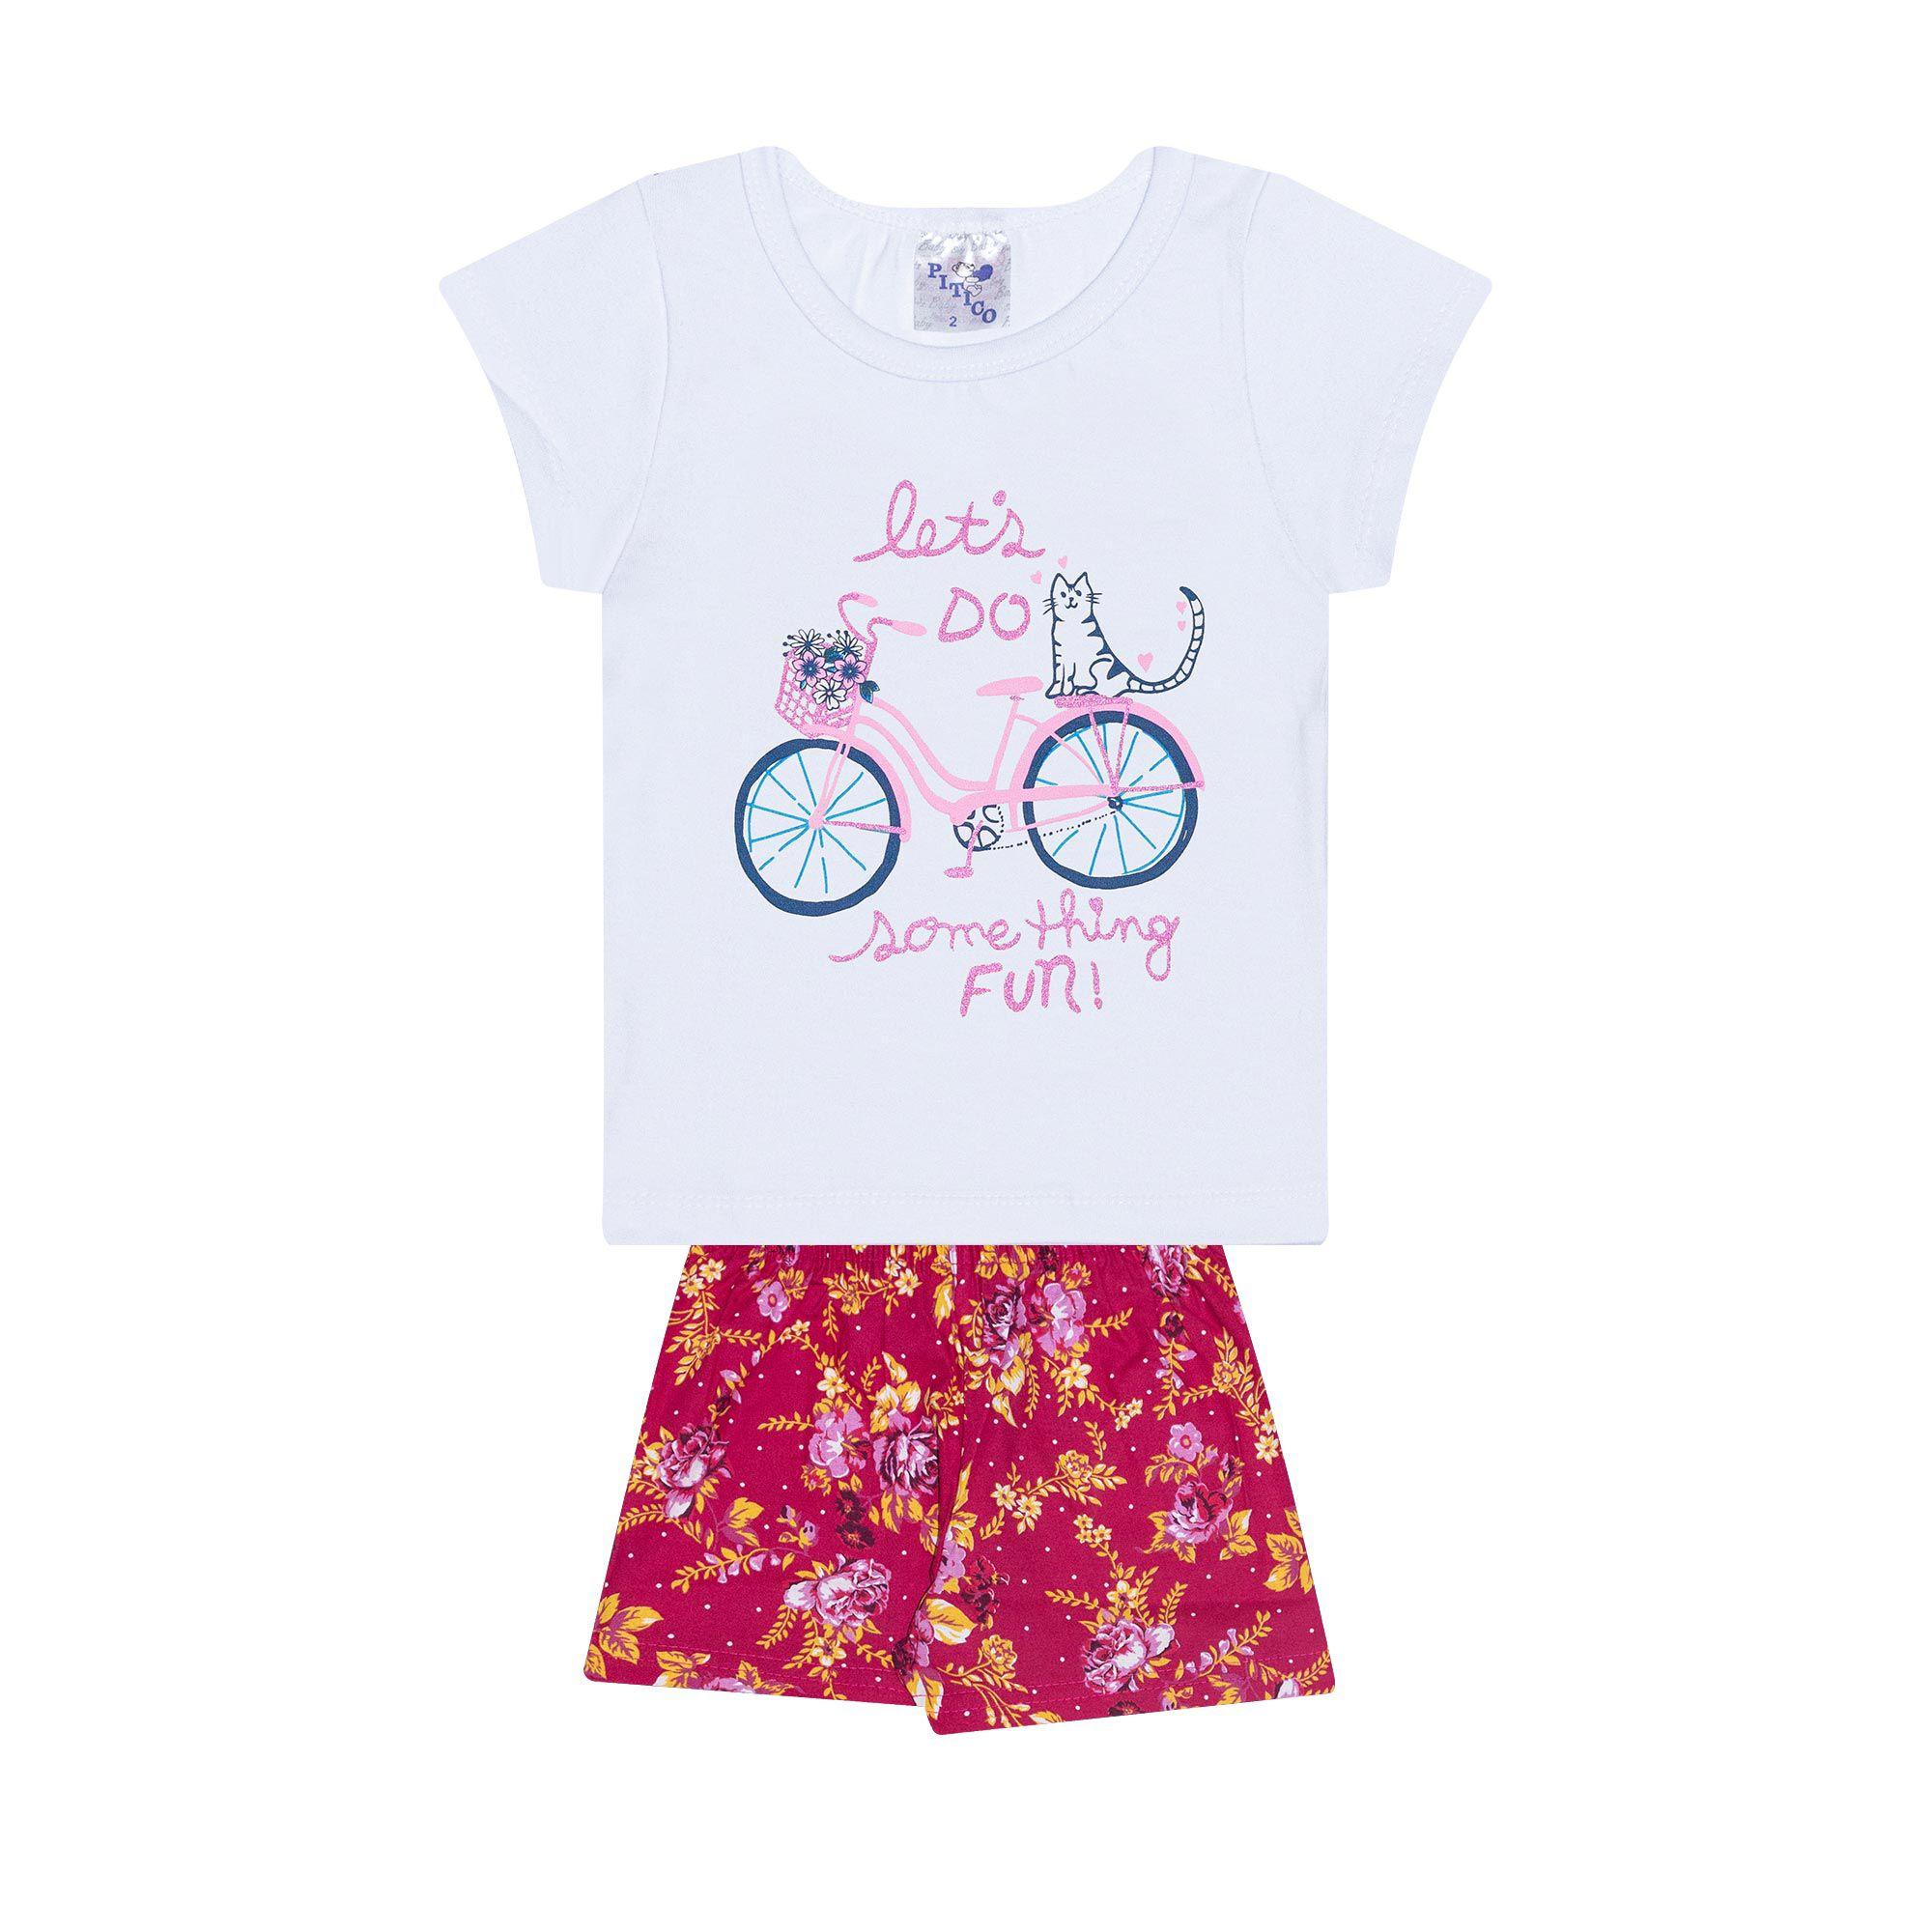 Conjunto Infantil Feminino - Ref 1010 - Branco/Pink - Pitico